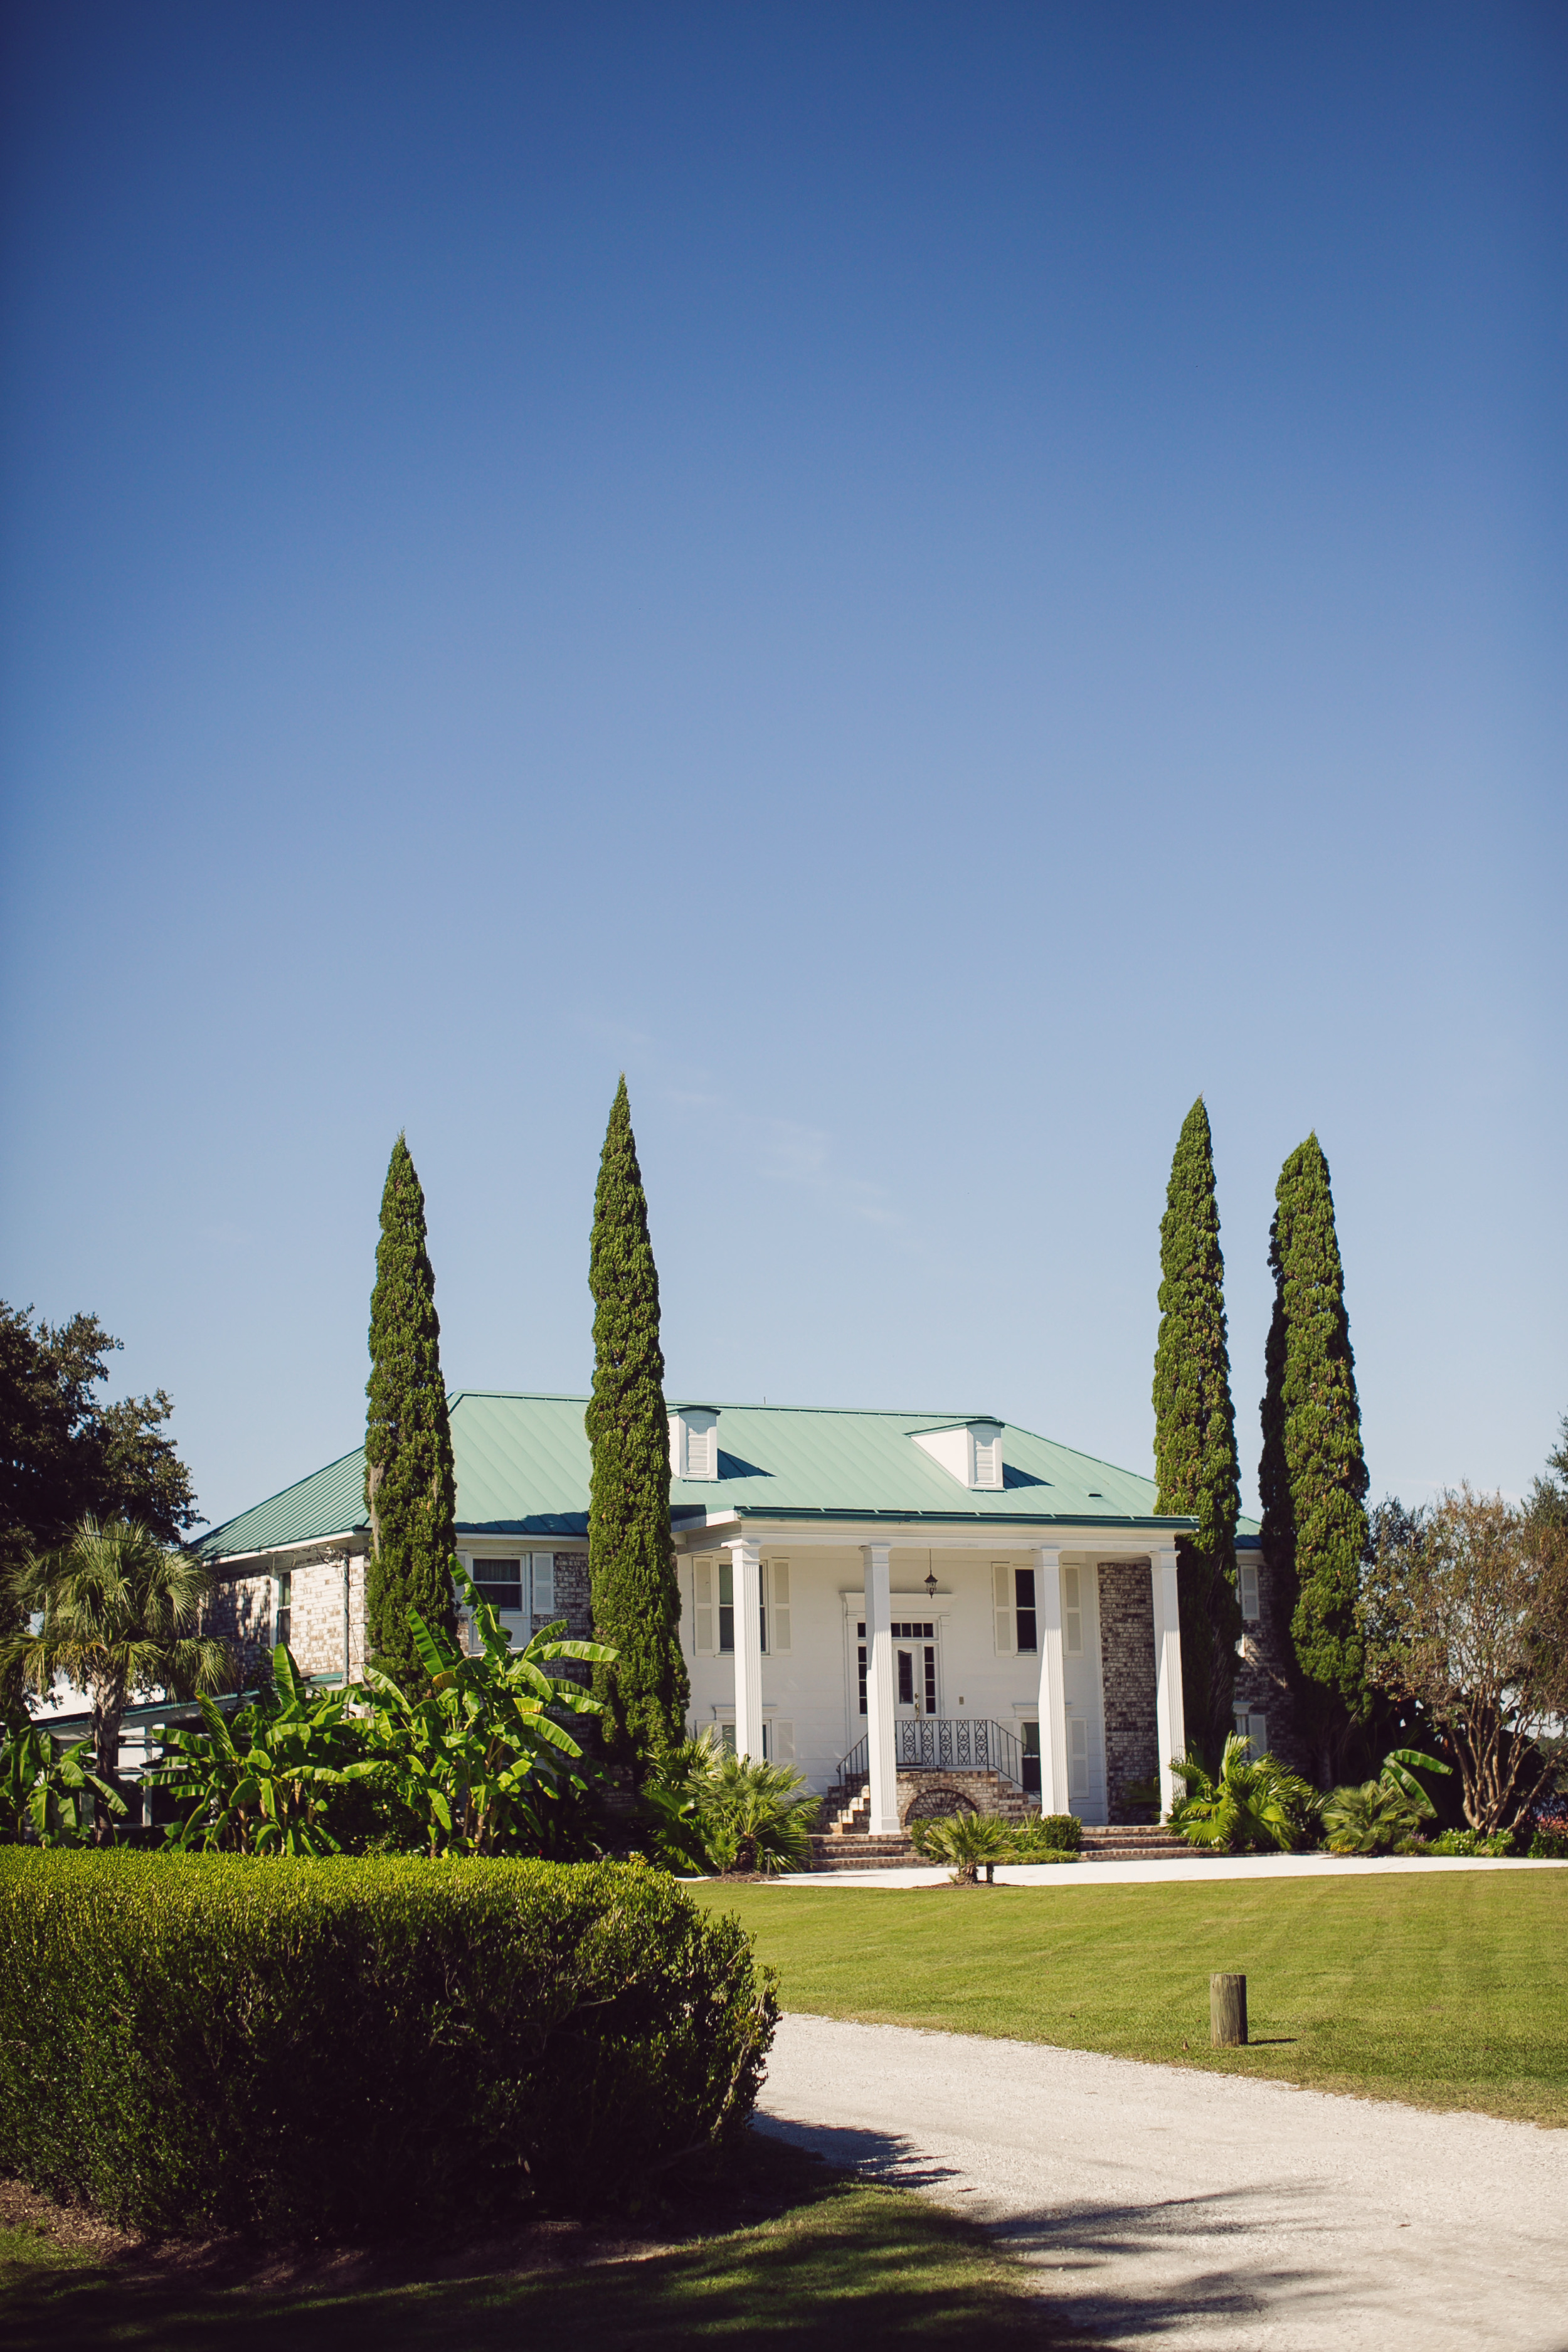 Charleston Wedding Venue - The Island House on Johns Island, South Carolina